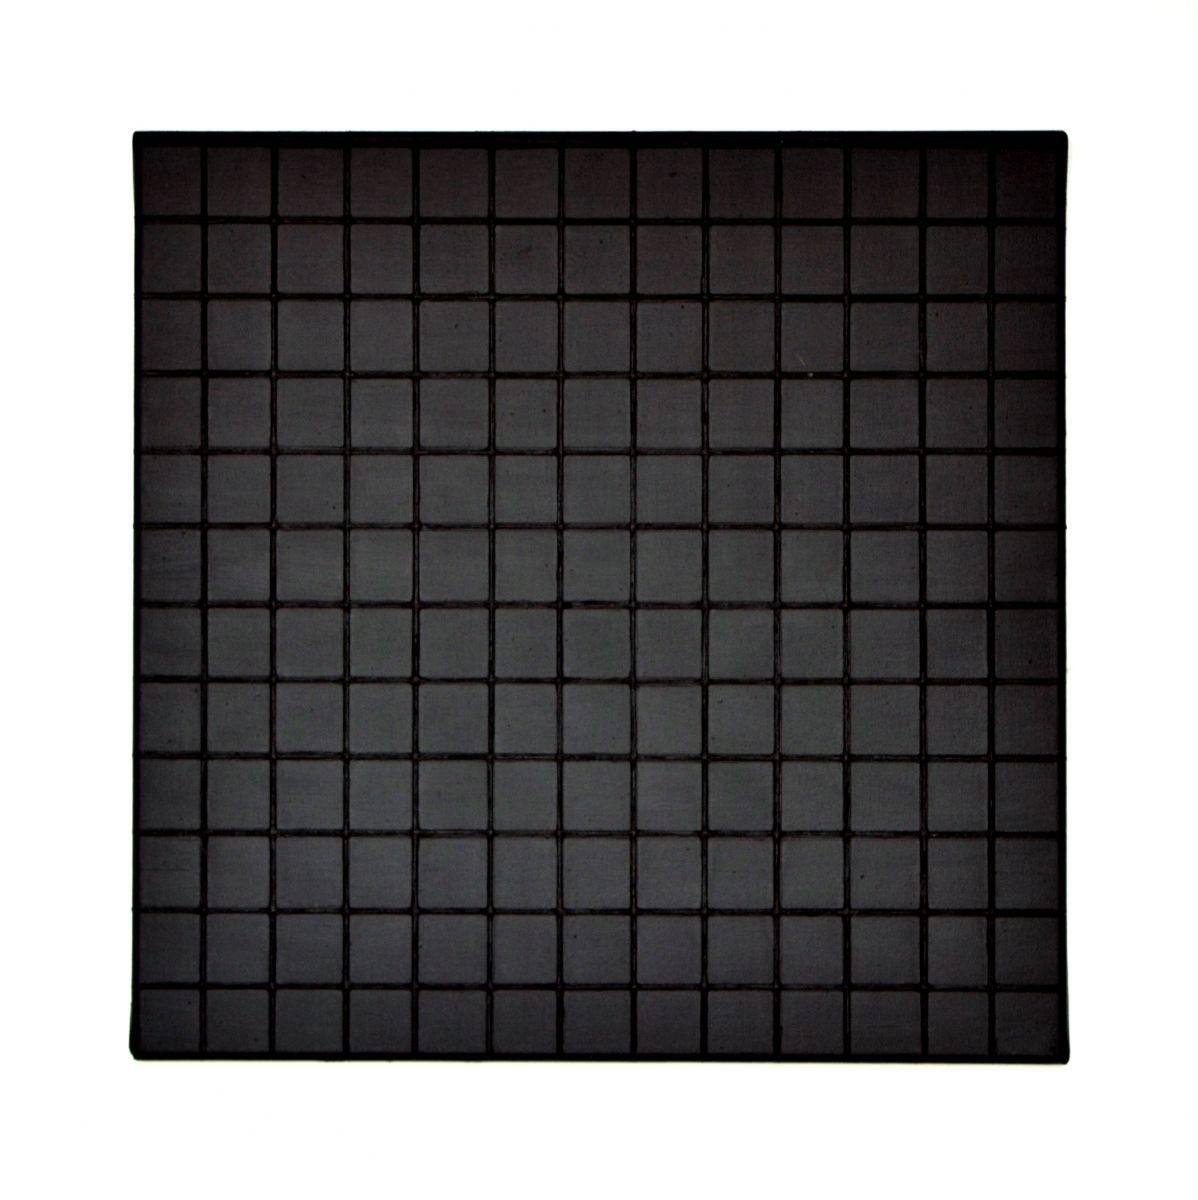 Quadrat-work-painting-eder-bilder